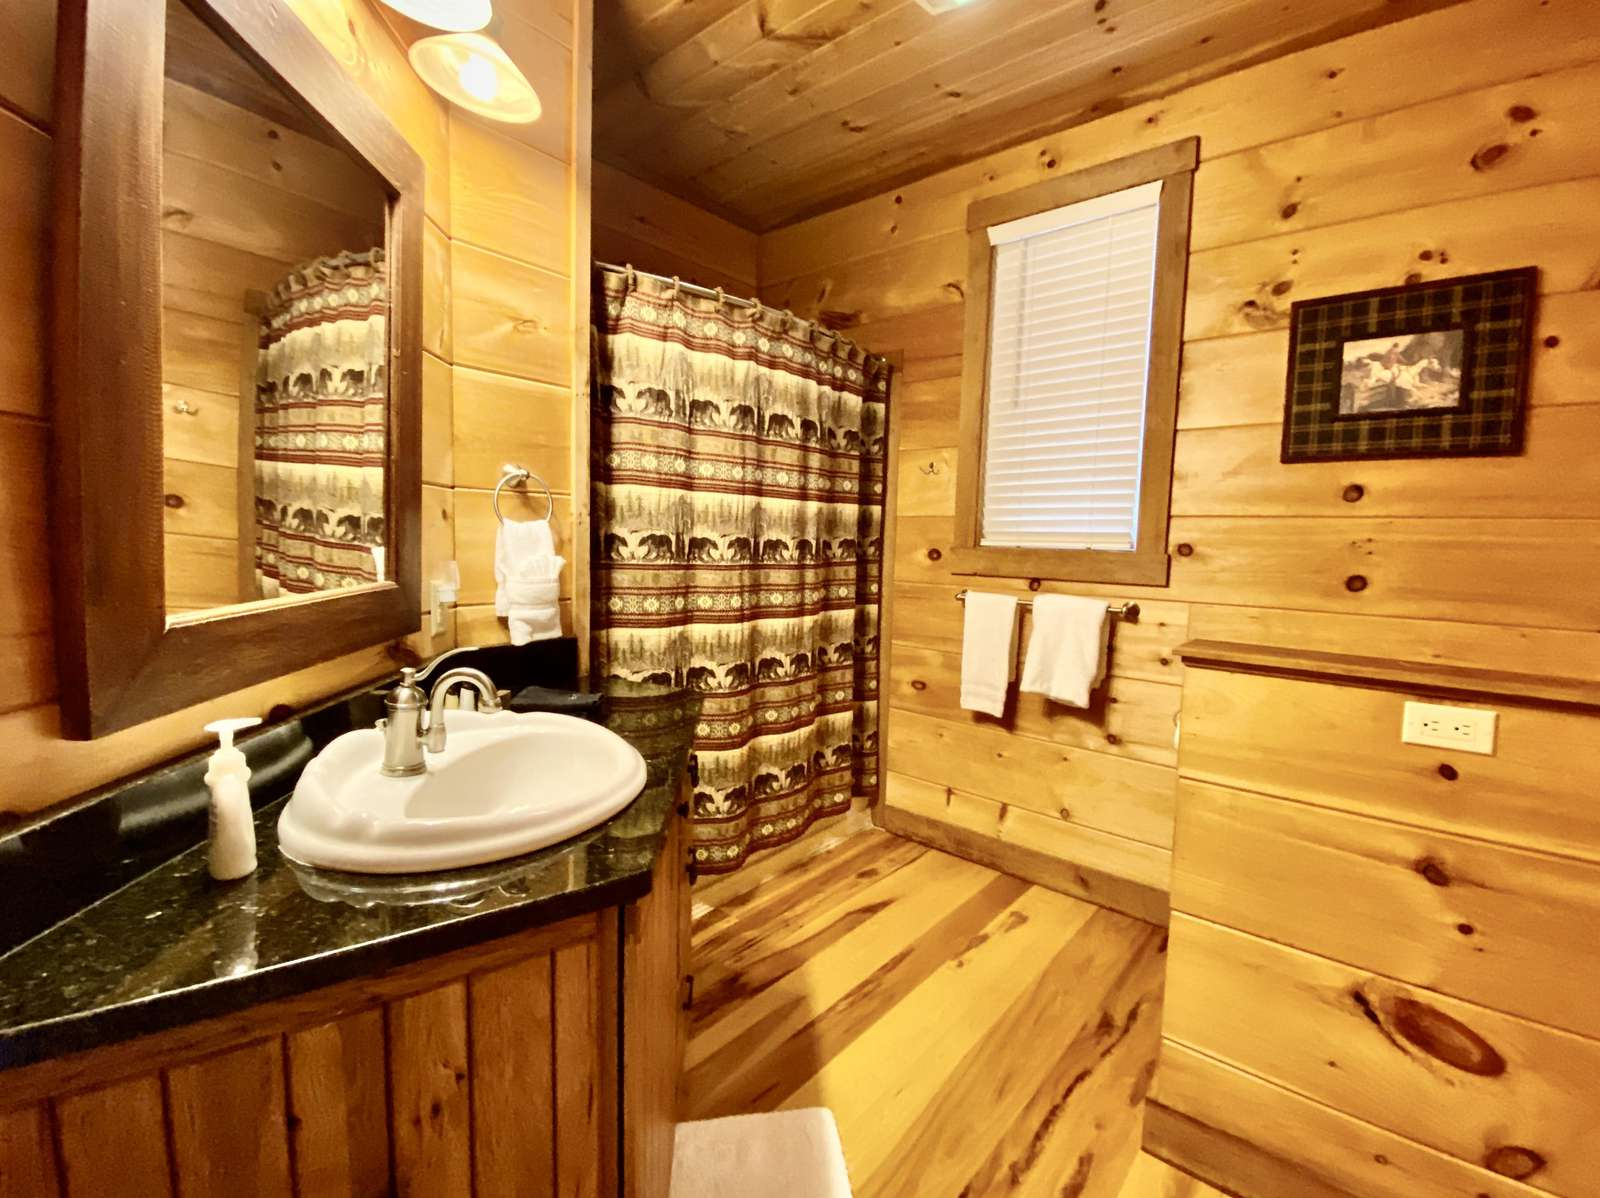 Main Level Bathroom, Tub/Shower Combo